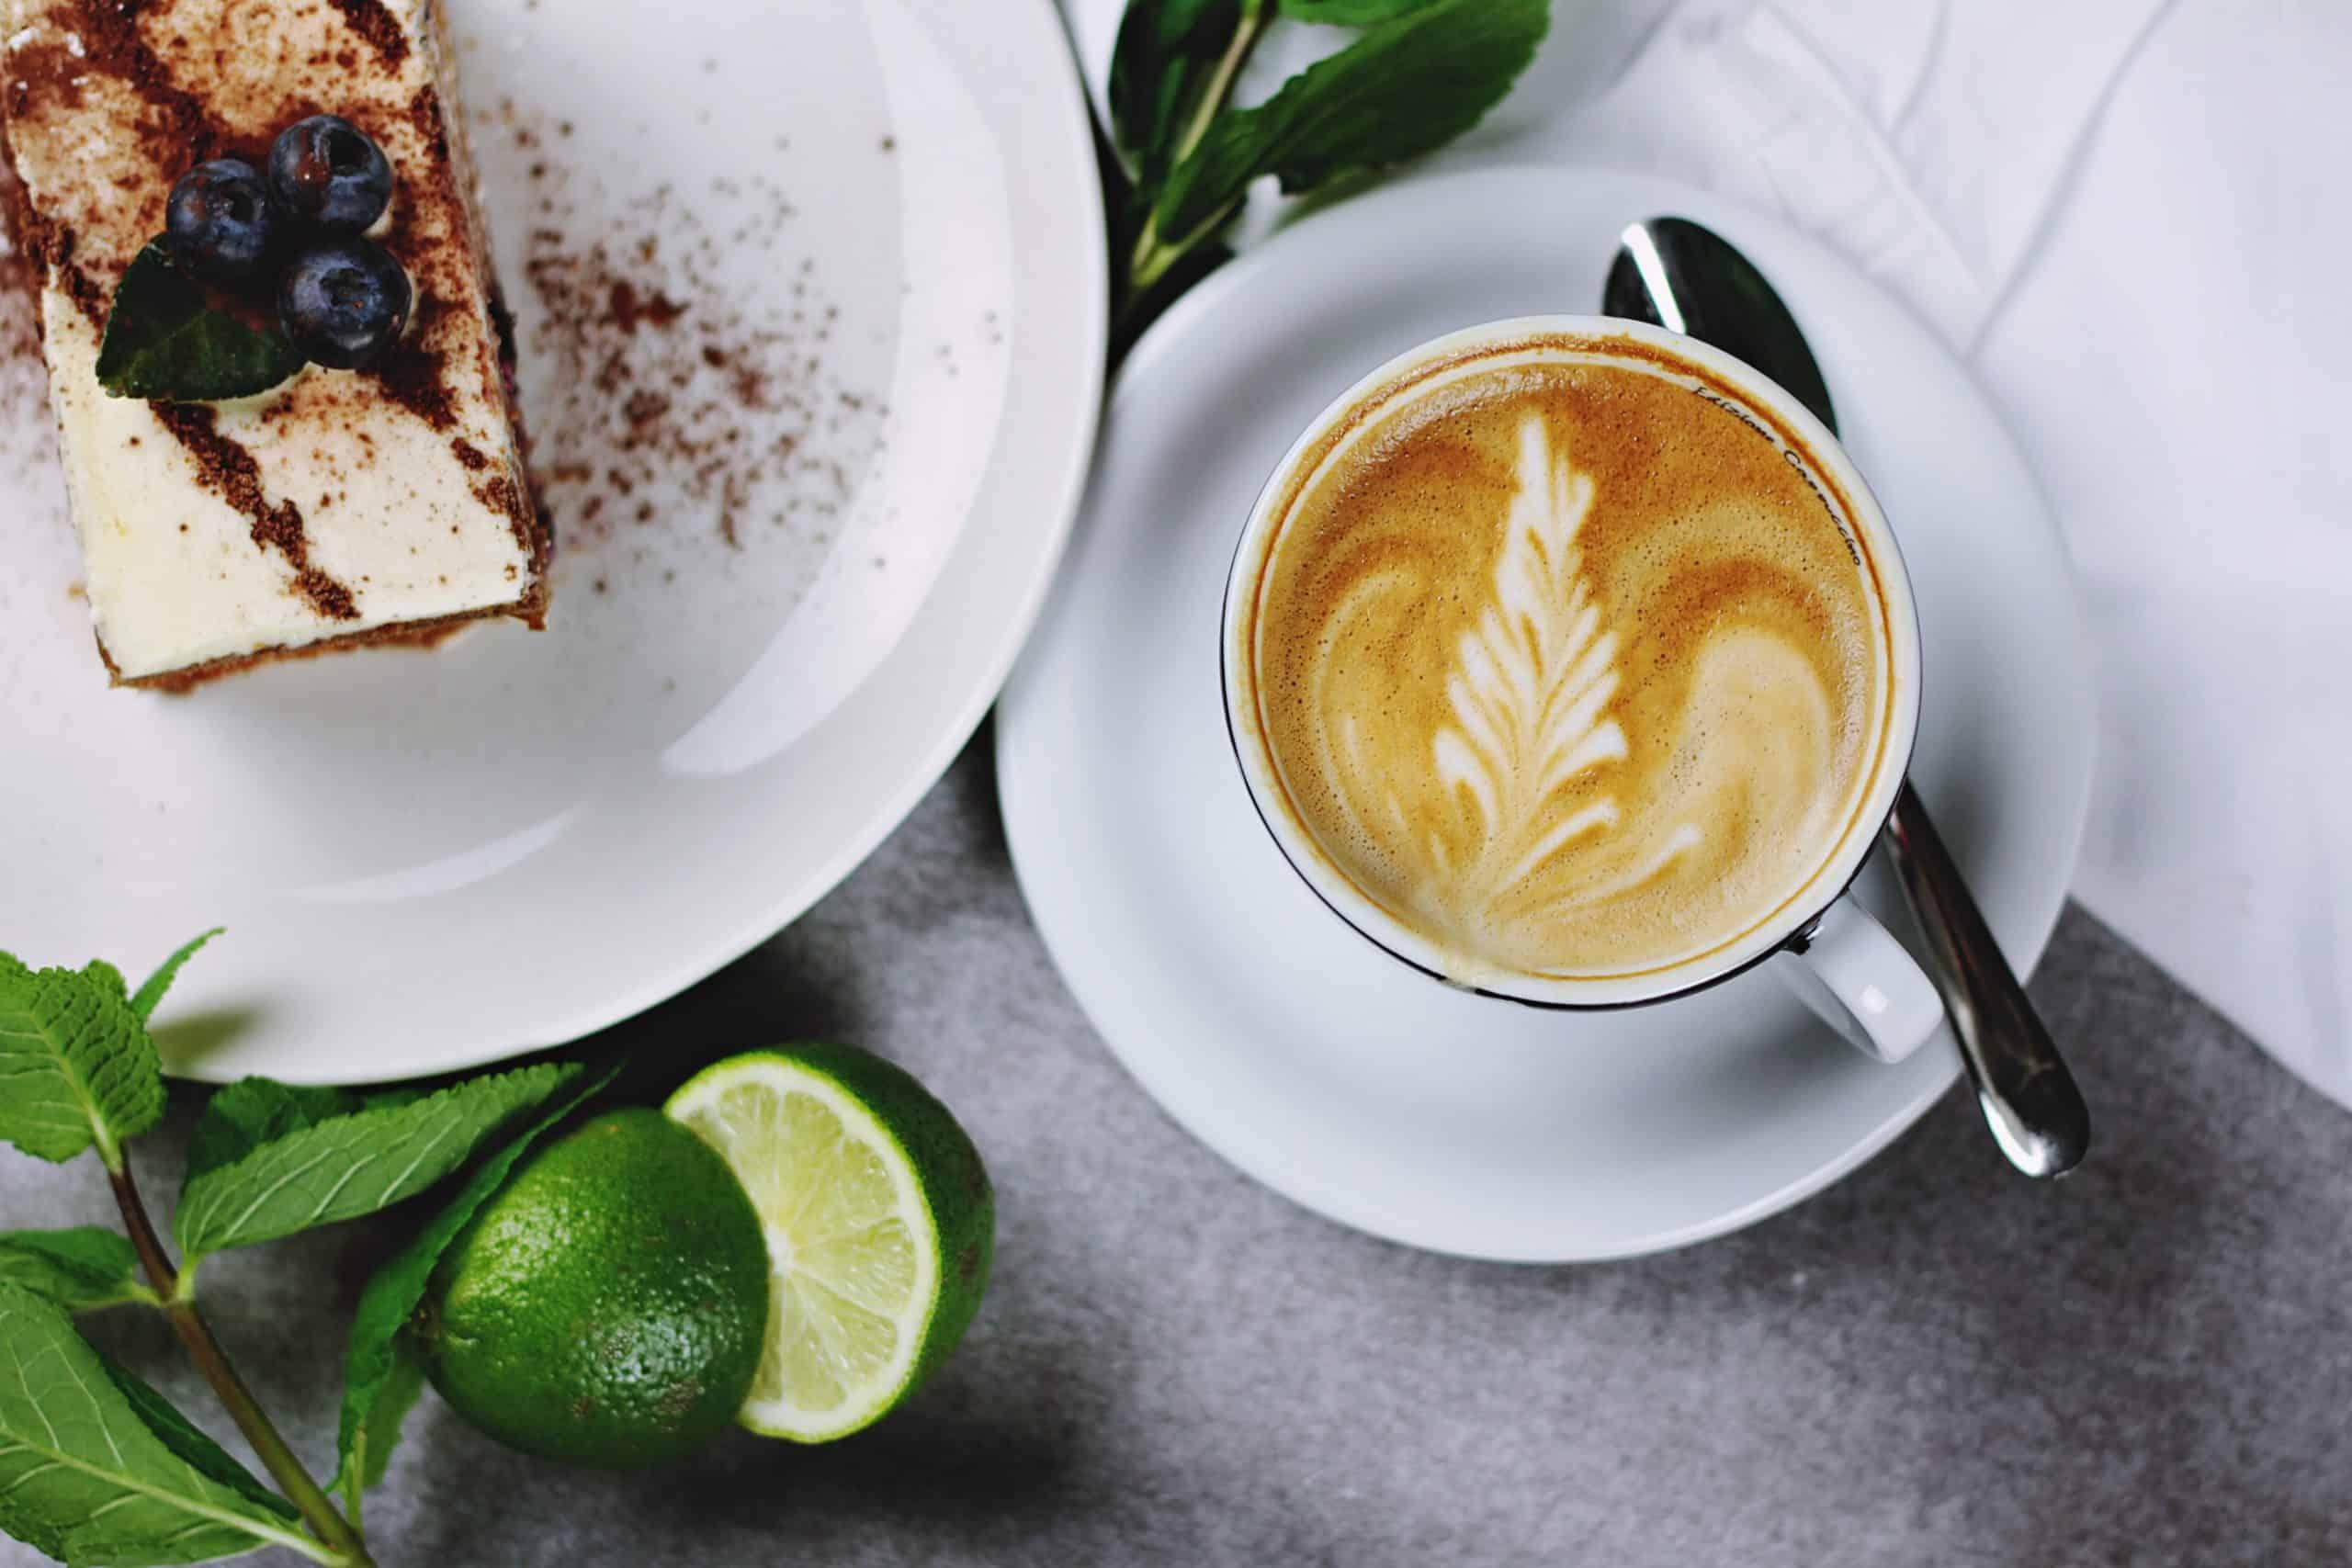 Cafes in Jakarta